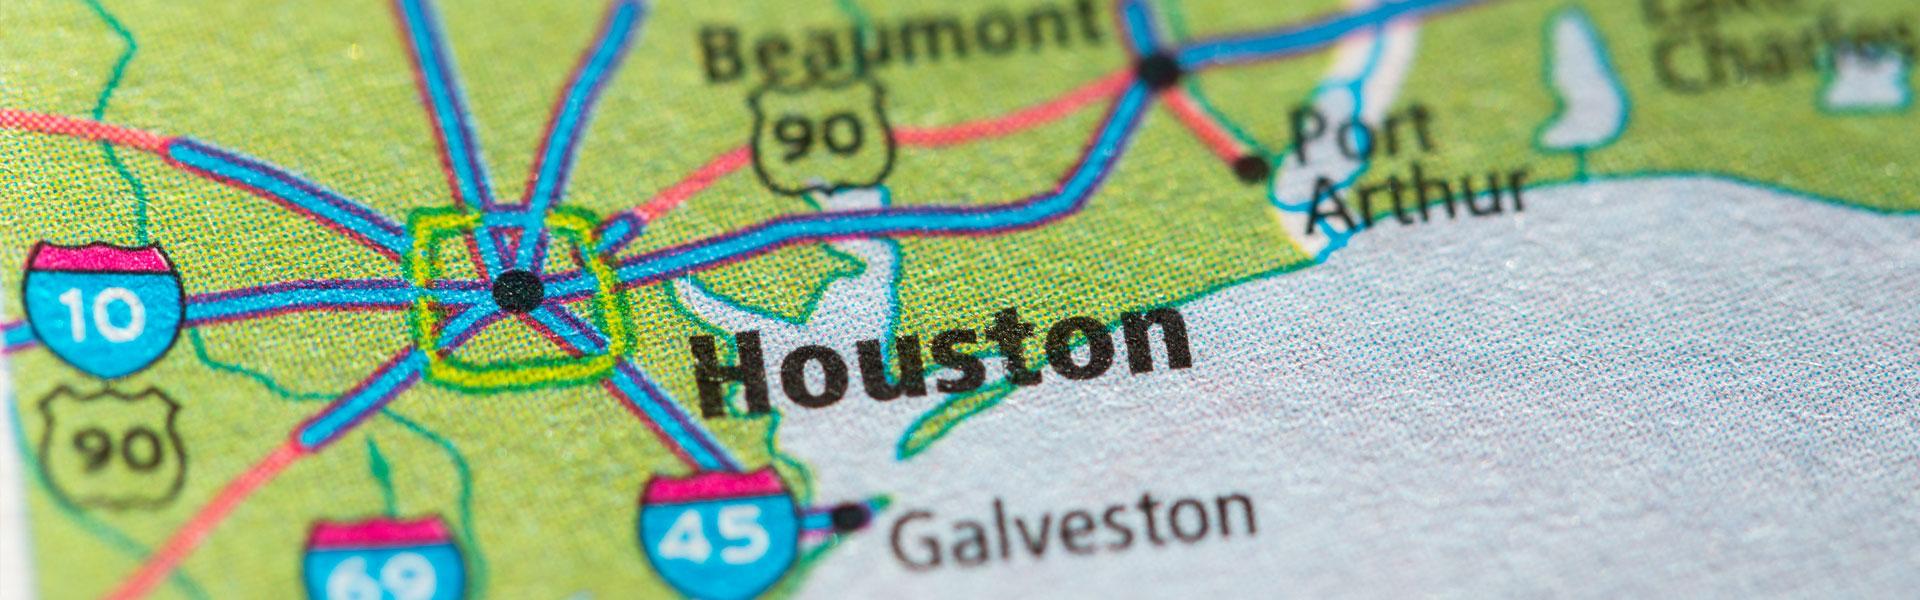 Map of Houston Metro Area